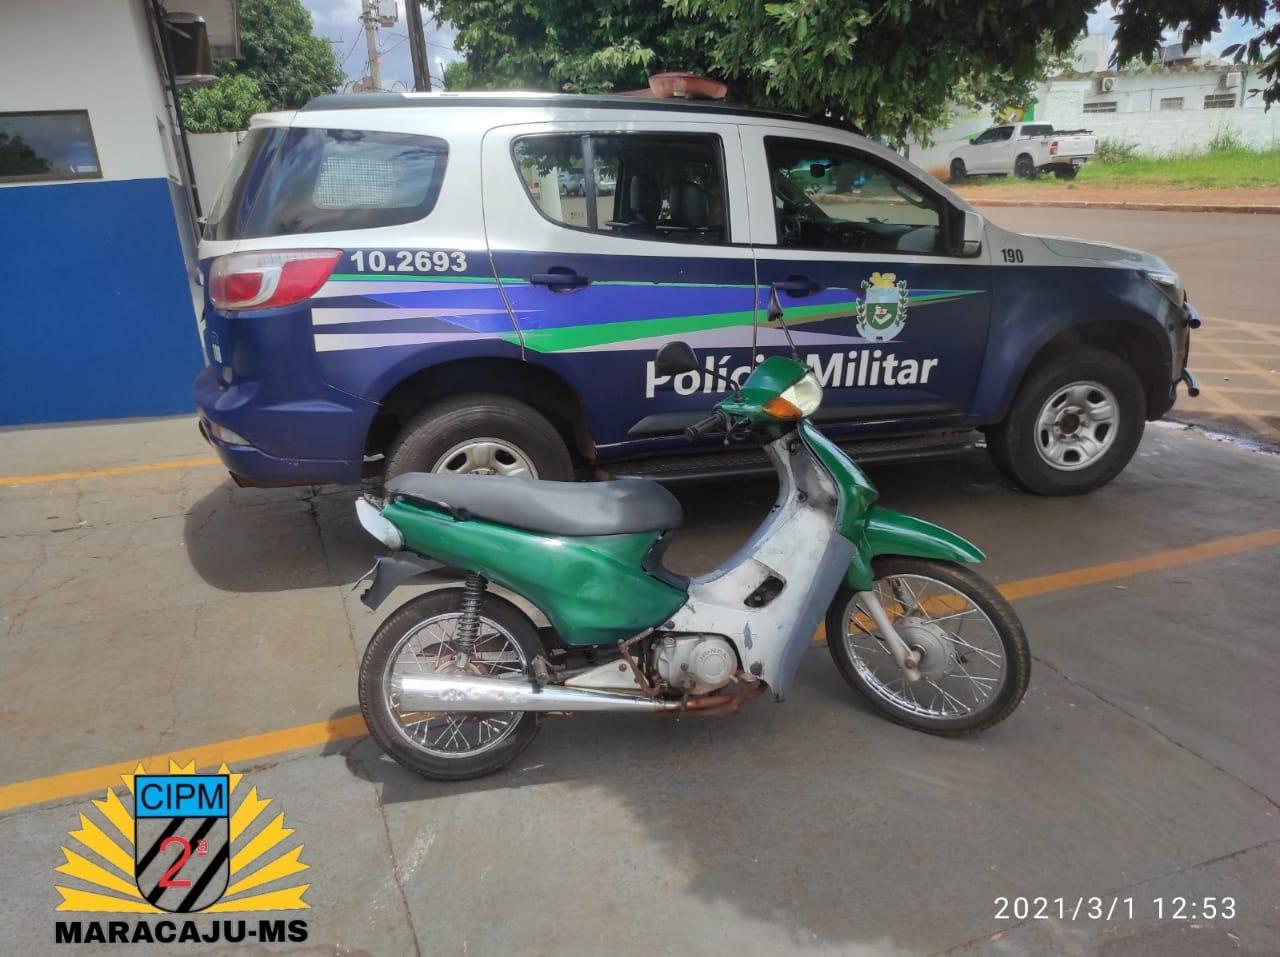 Polícia Militar de Maracaju recupera veículo com queixa de Furto/Roubo